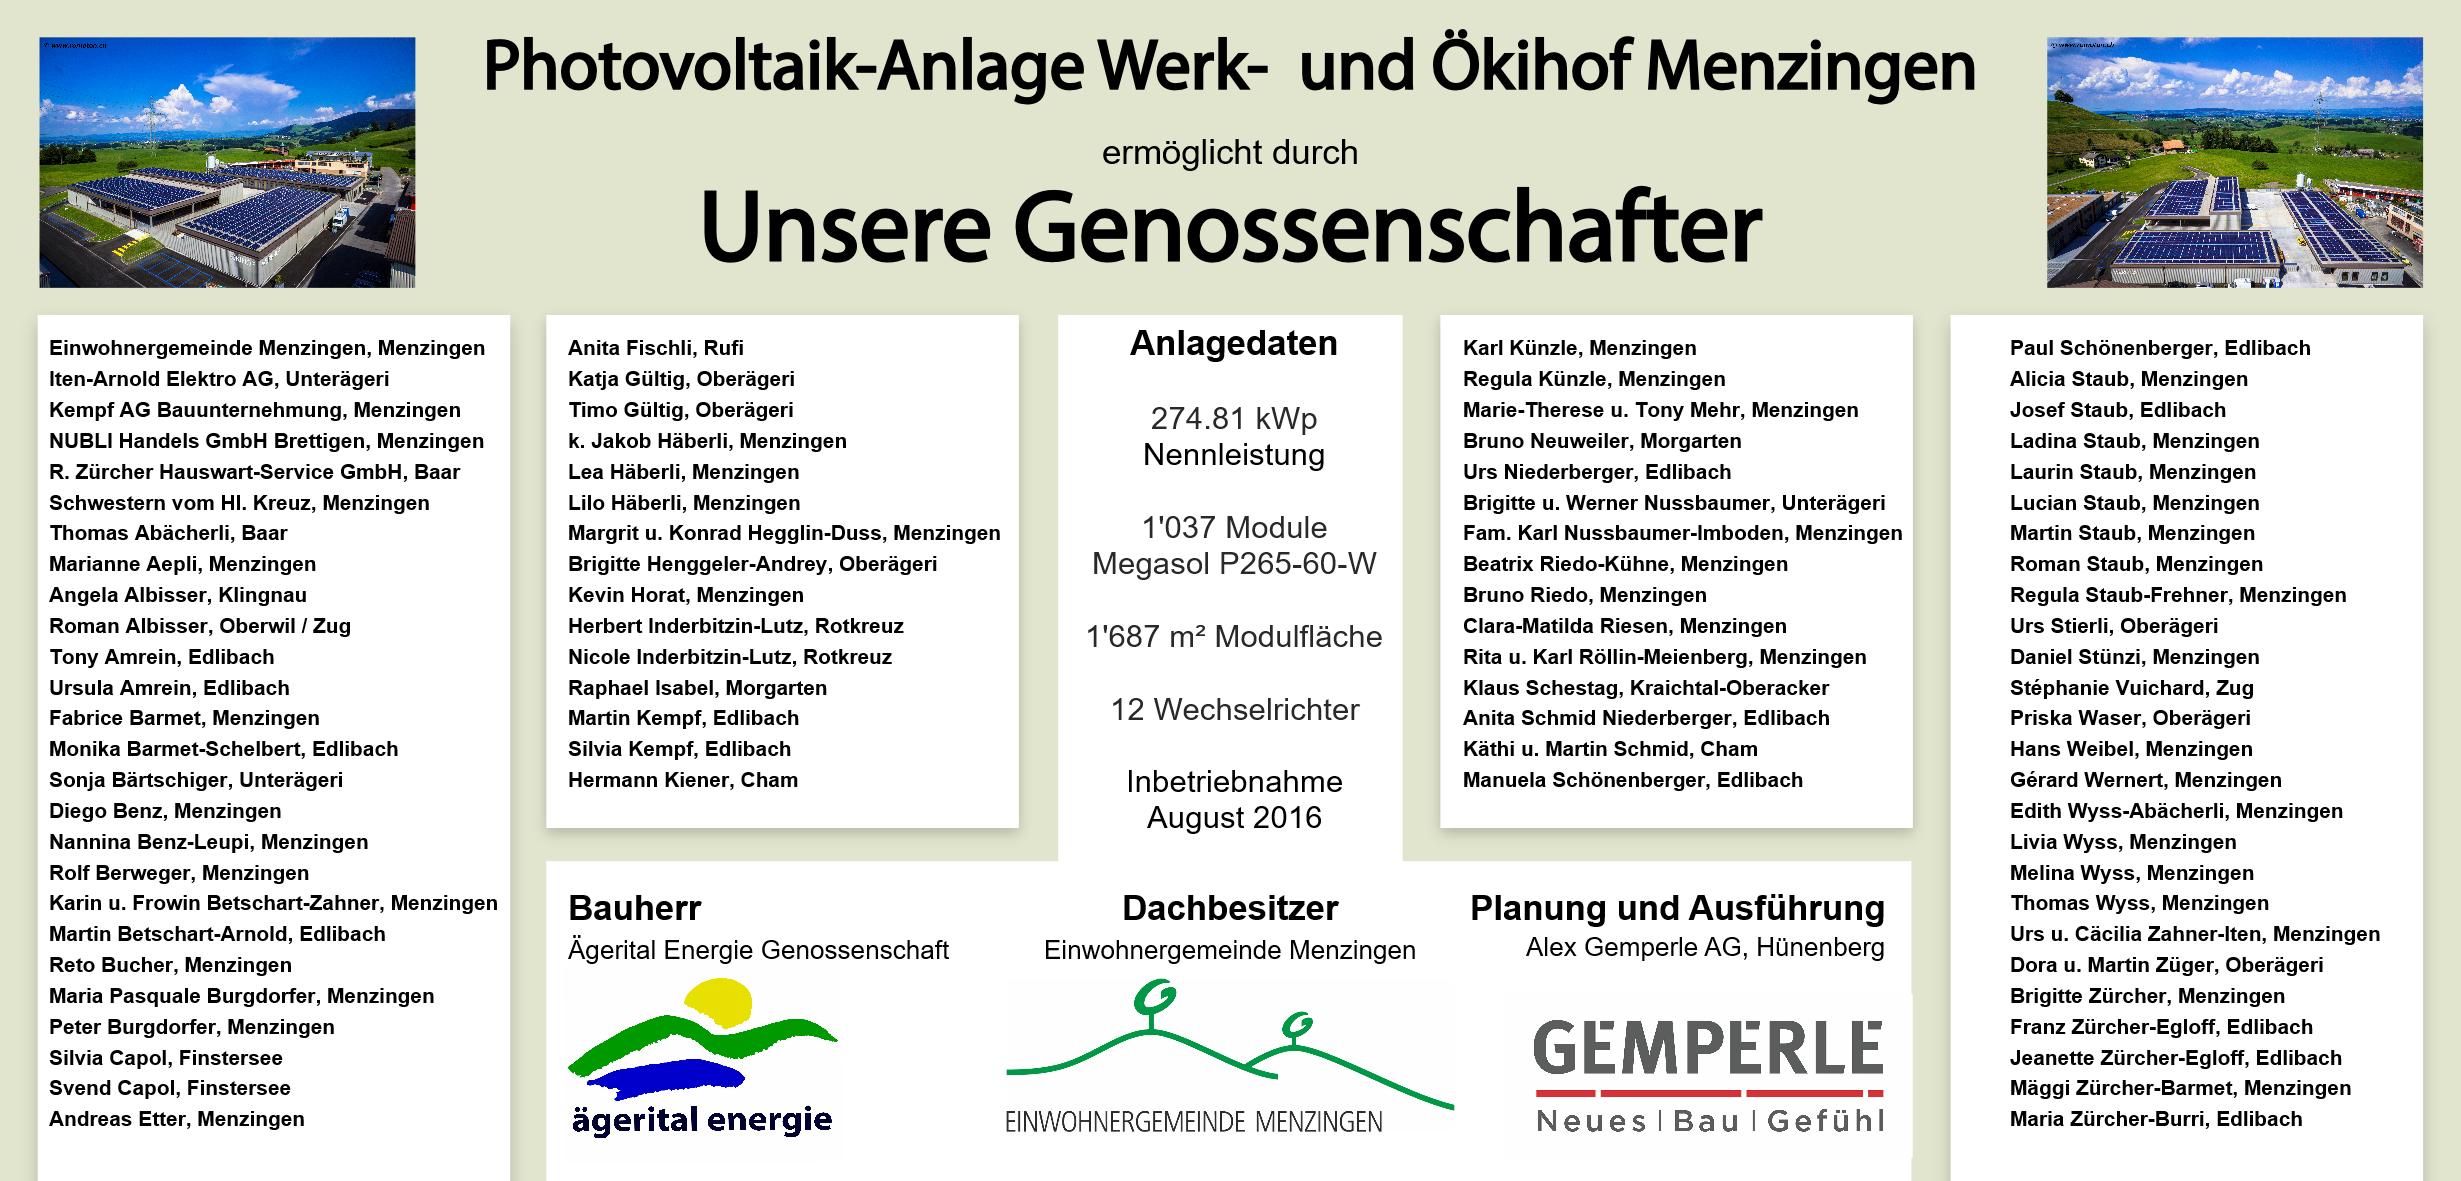 Genossenschaftstafel Werk- und Ökihof Menzingen